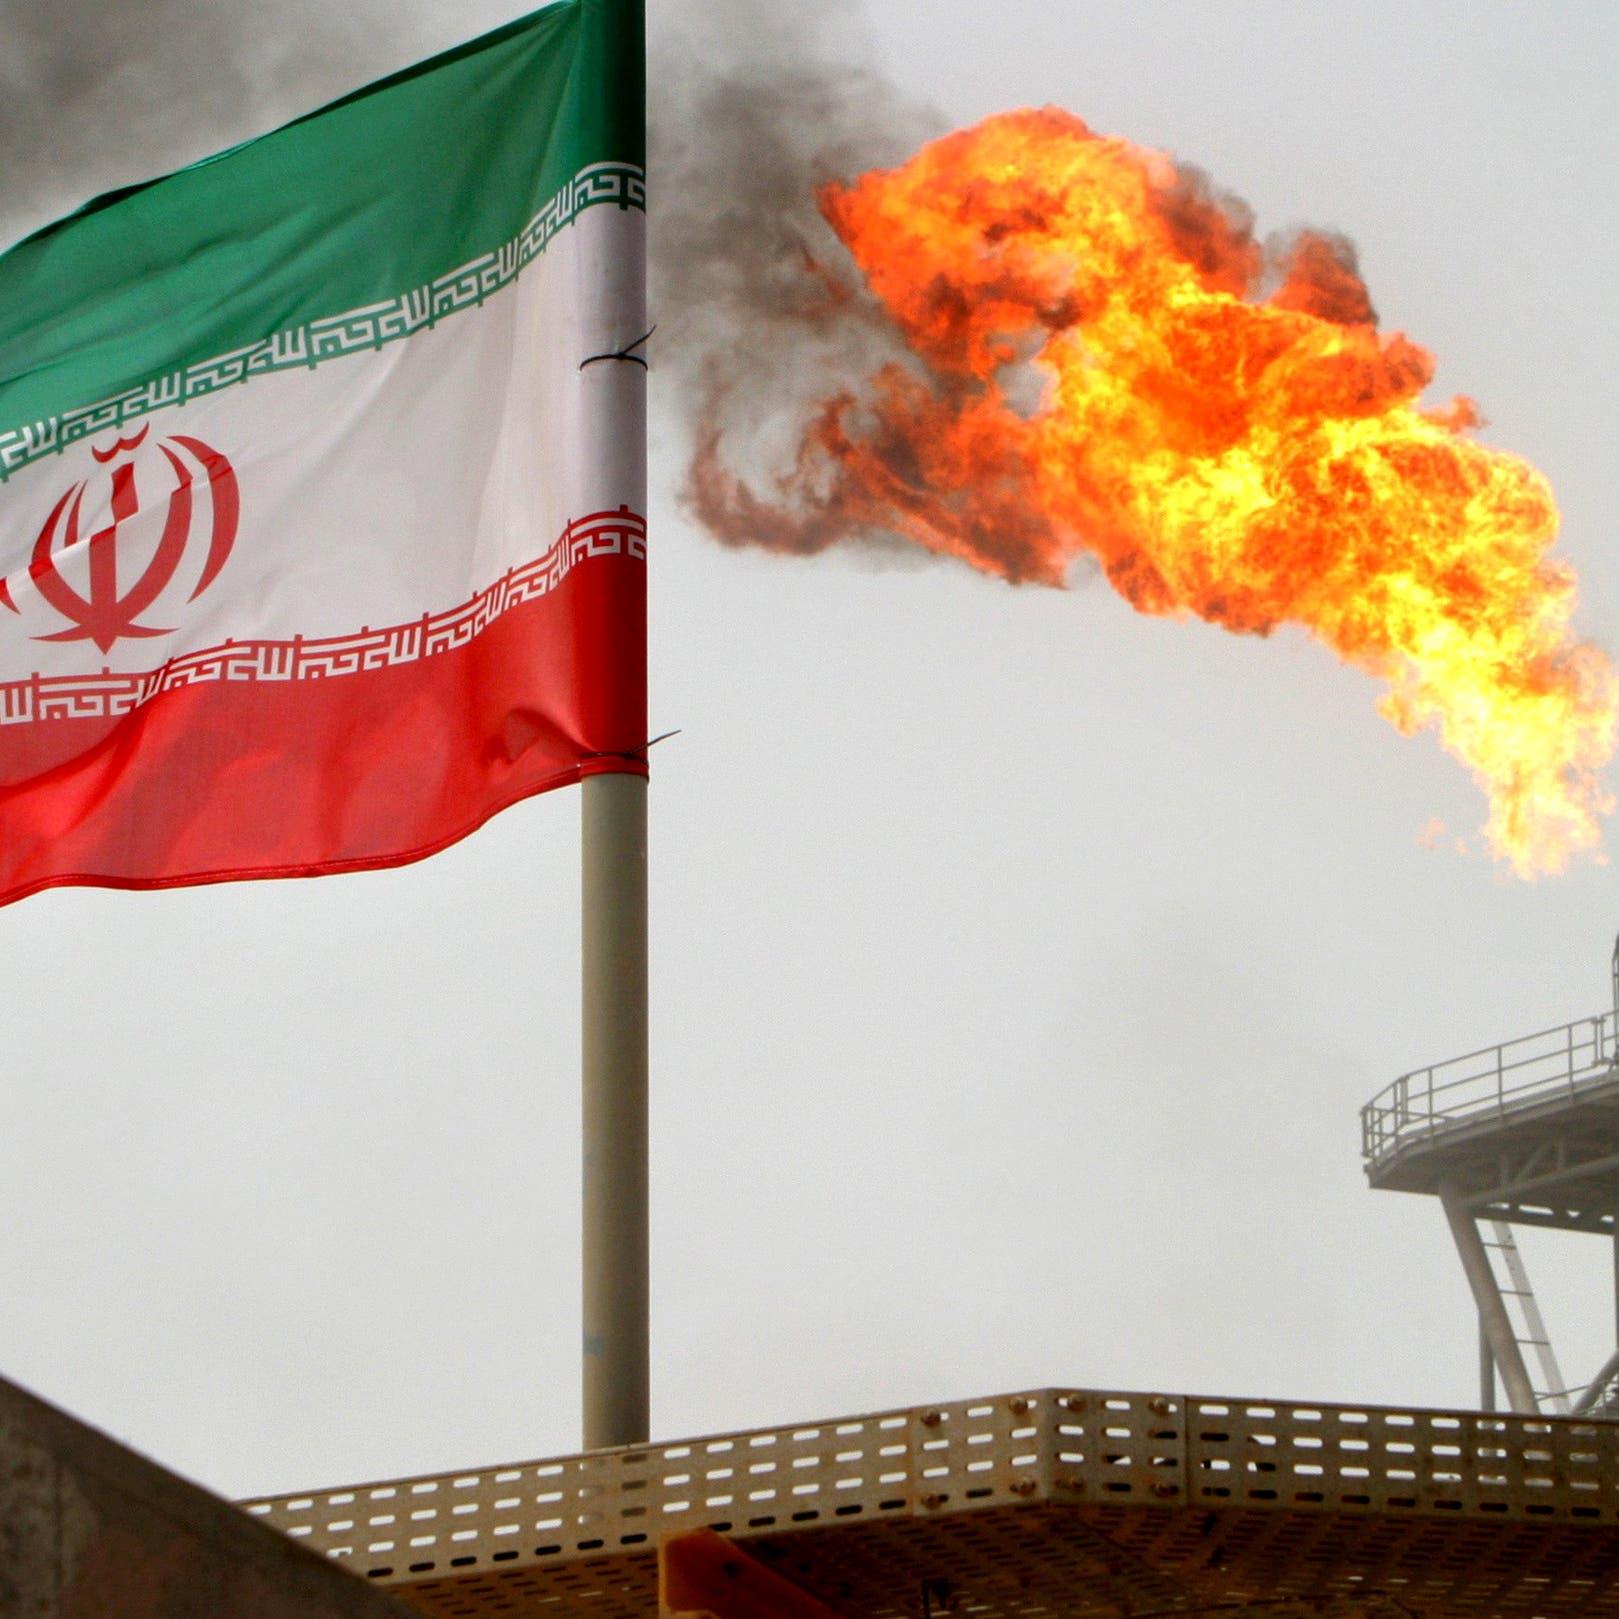 اتهامات لشركتين لبنانيتين بنقل نفط إيران سراً إلى سوريا